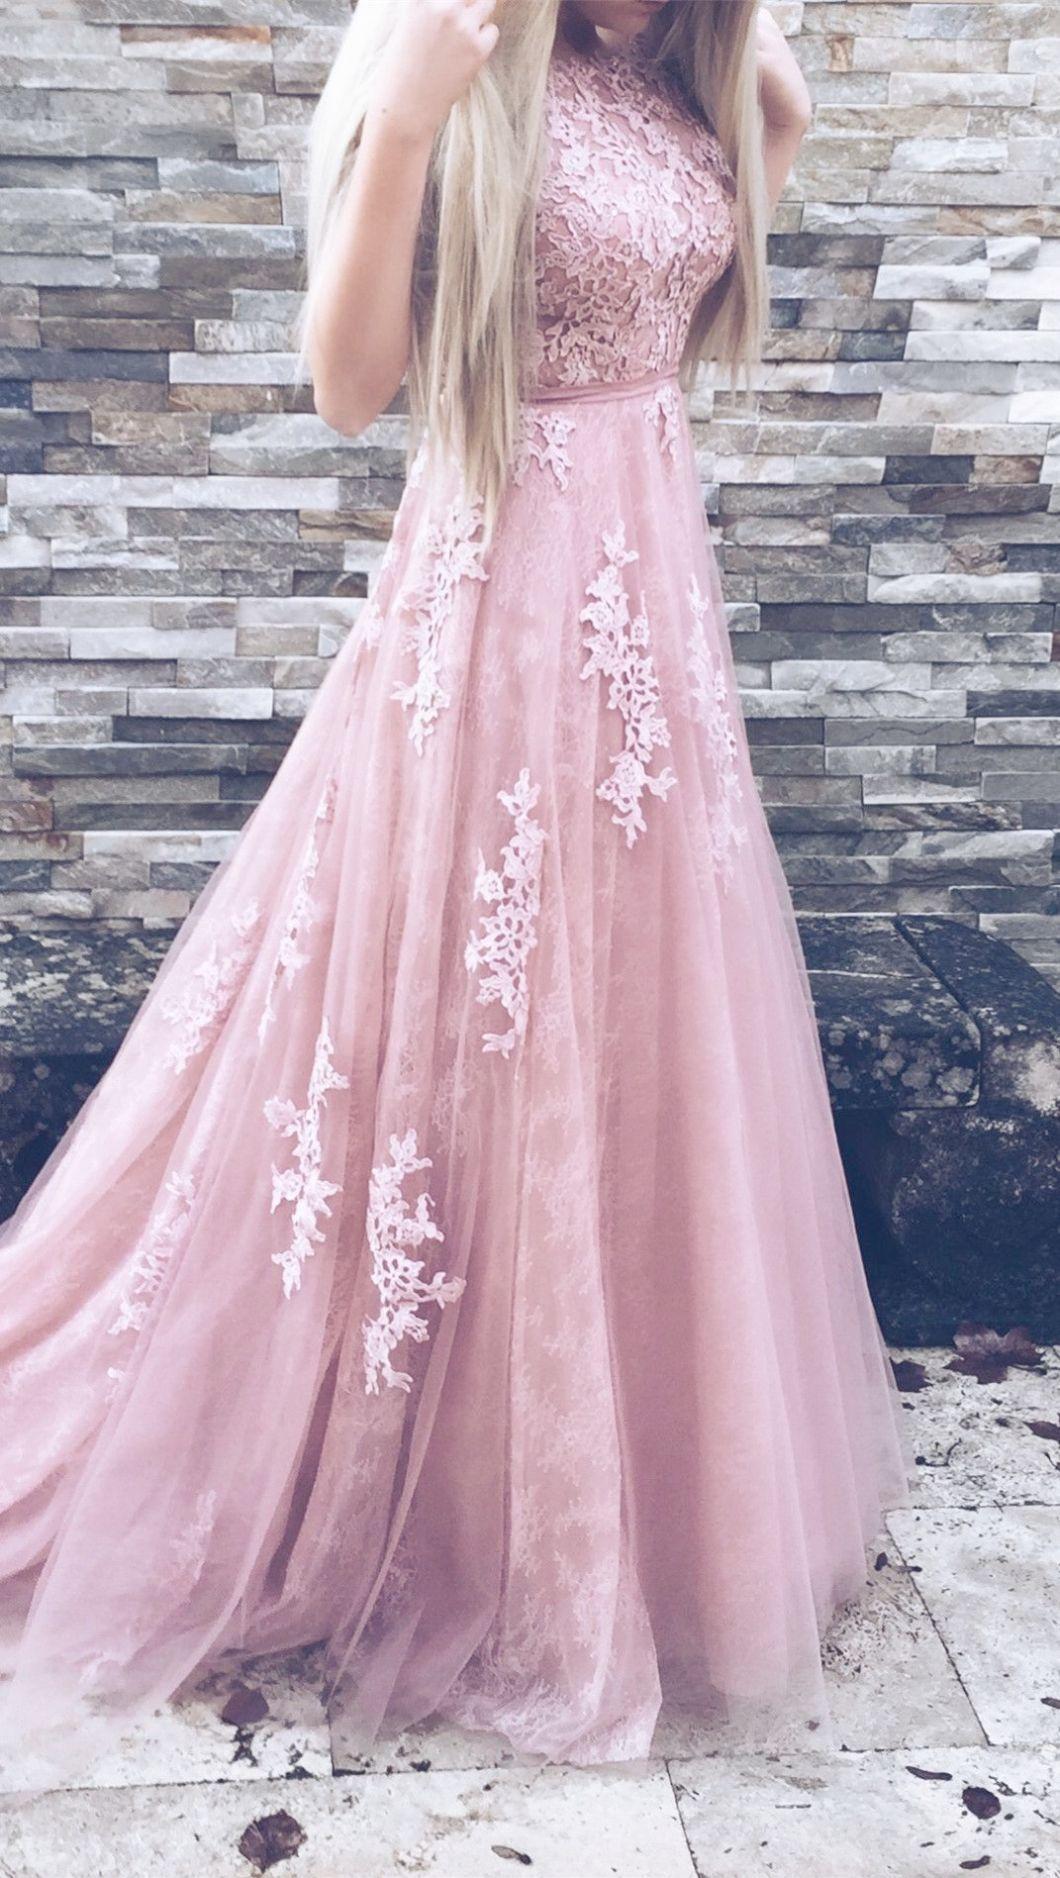 1557a171a21 Terrific    Long Homecoming Dresses Under 100 Dollars  superb ...